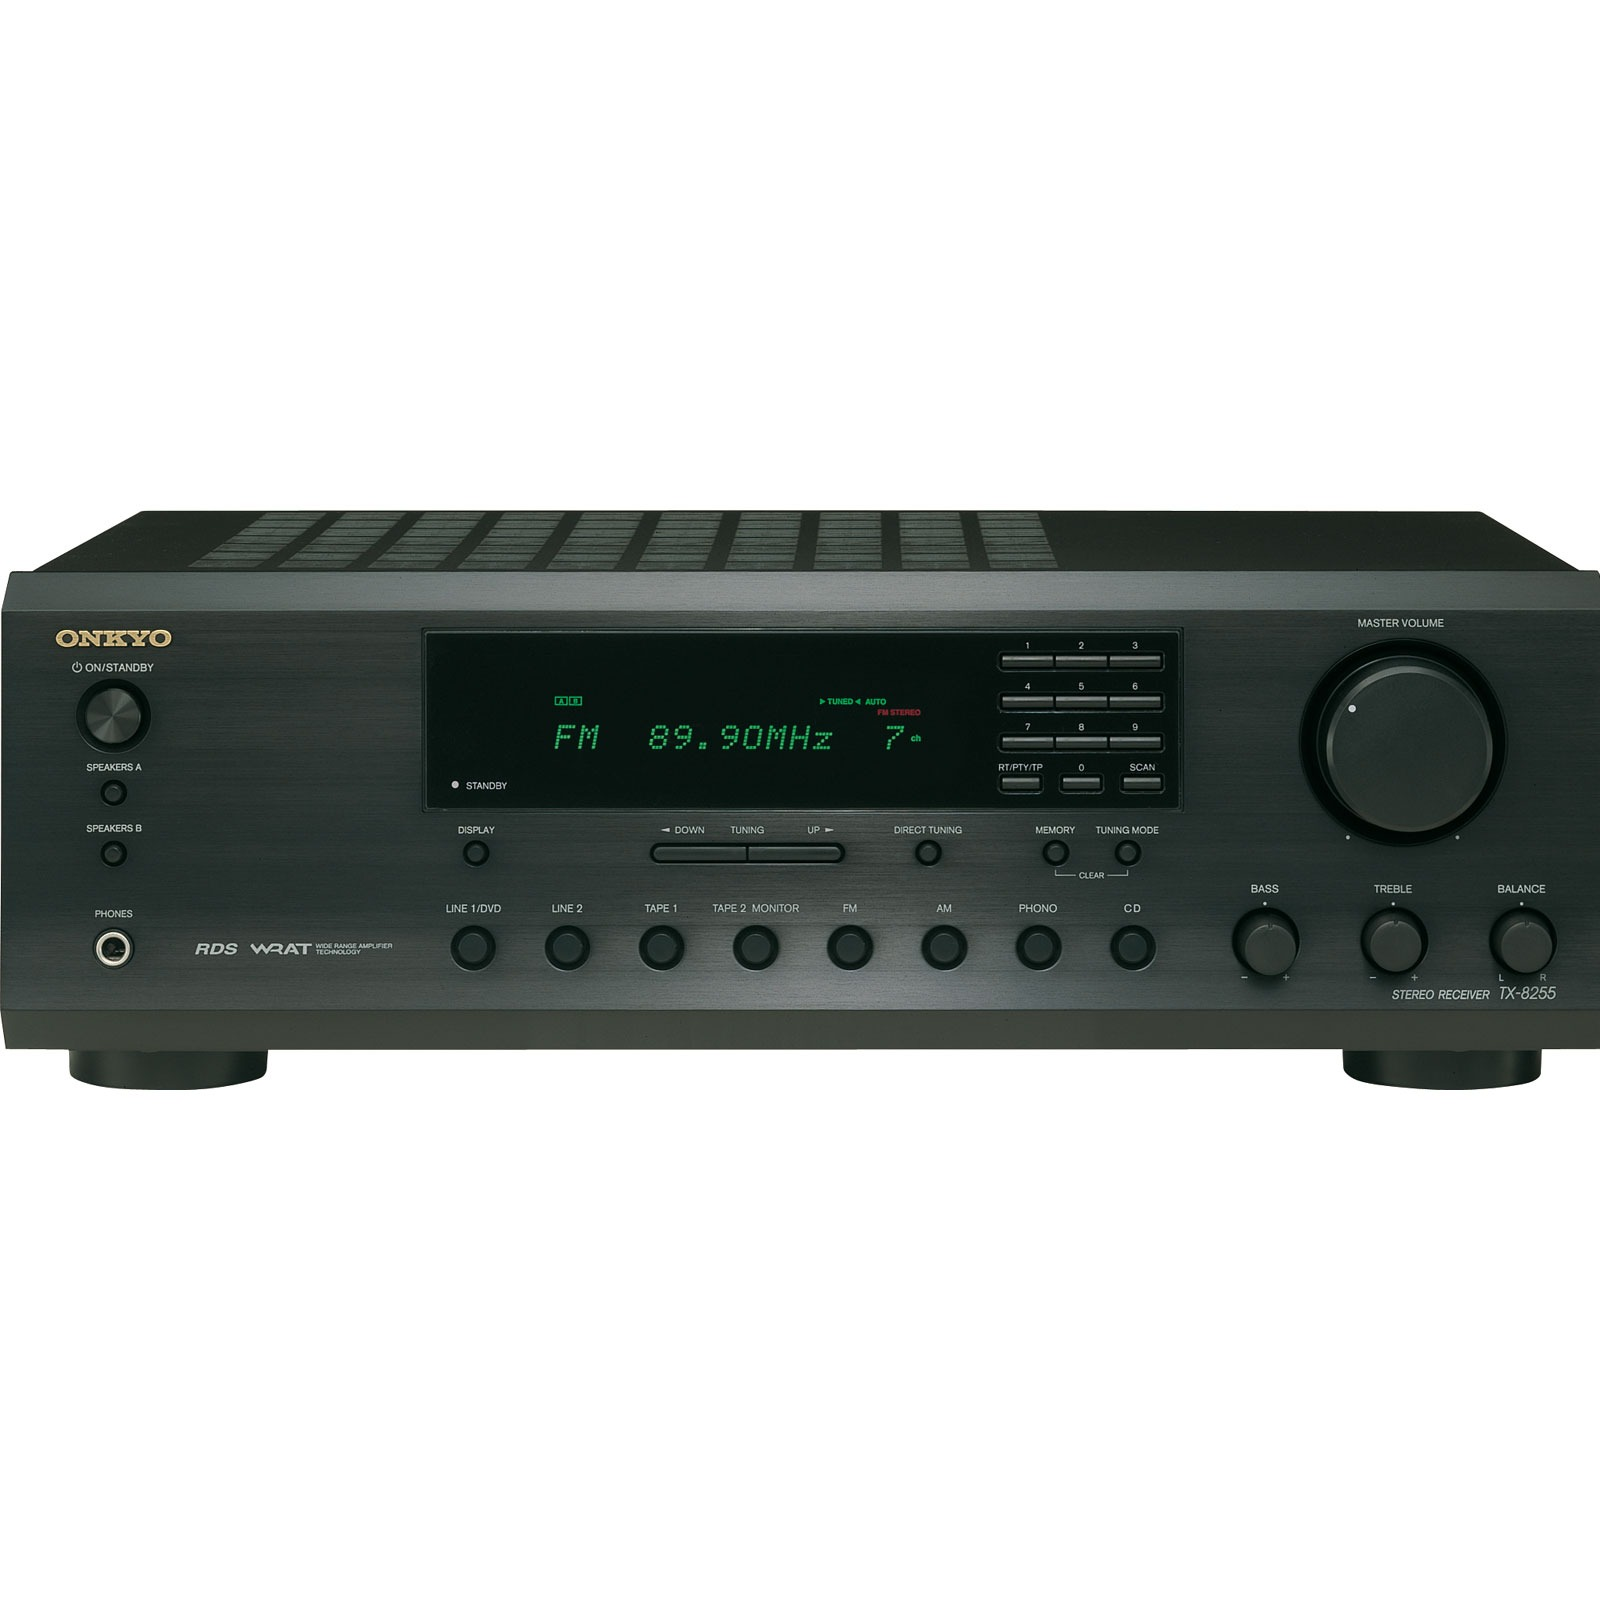 Amplificateur Hifi Onkyo TX-8255 Noir Onkyo TX-8255 - Amplificateur-Tuner stéréo 2 x 90 W (coloris noir)